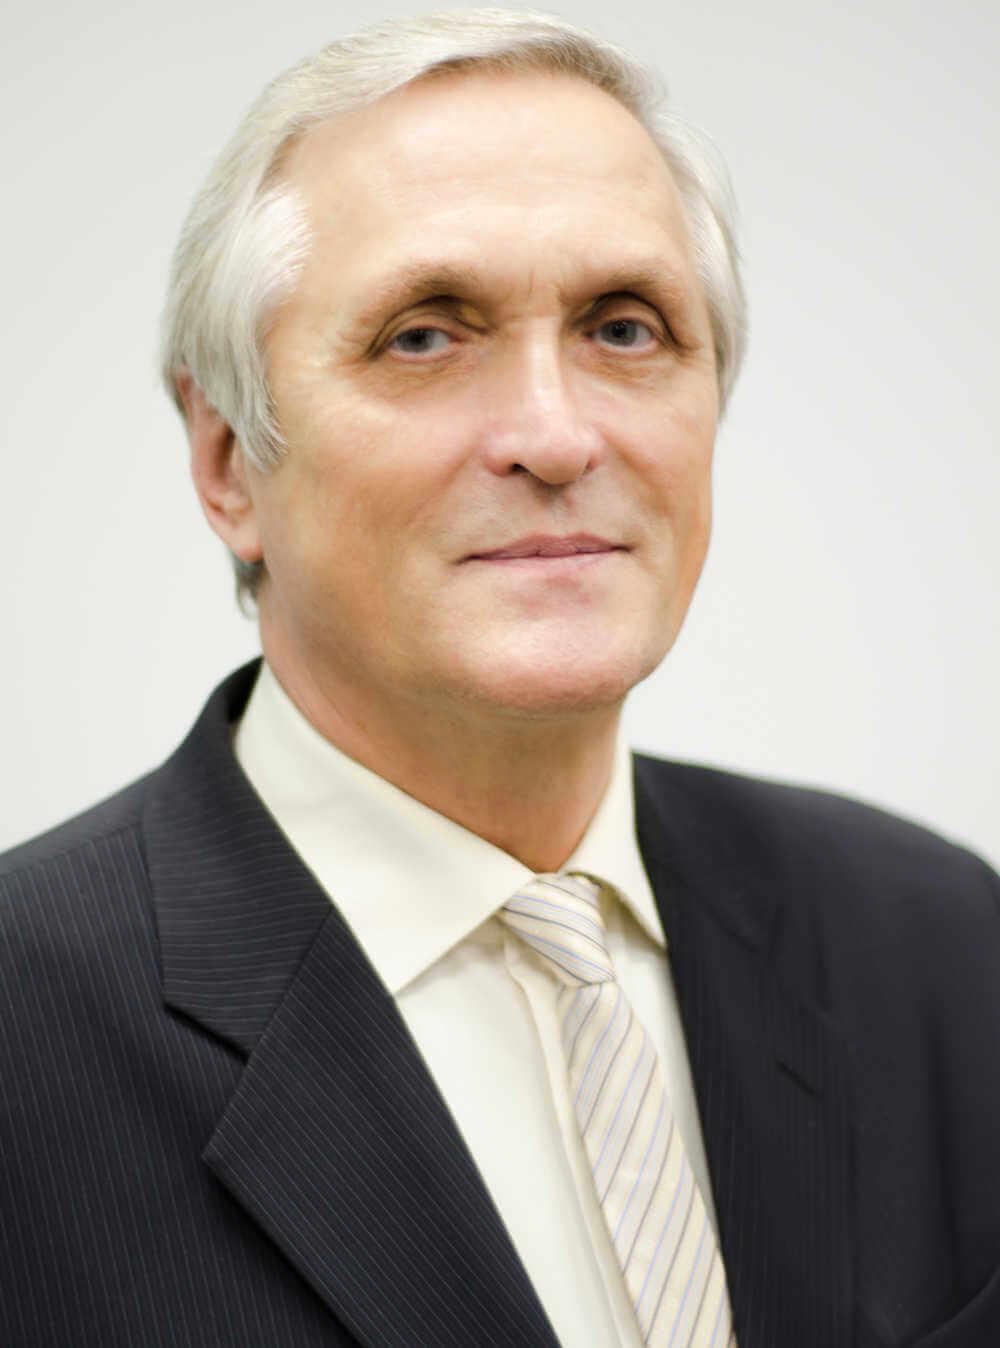 Петрищев Вячеслав Николаевич, ректор МНЭПУ, кандидат политических наук